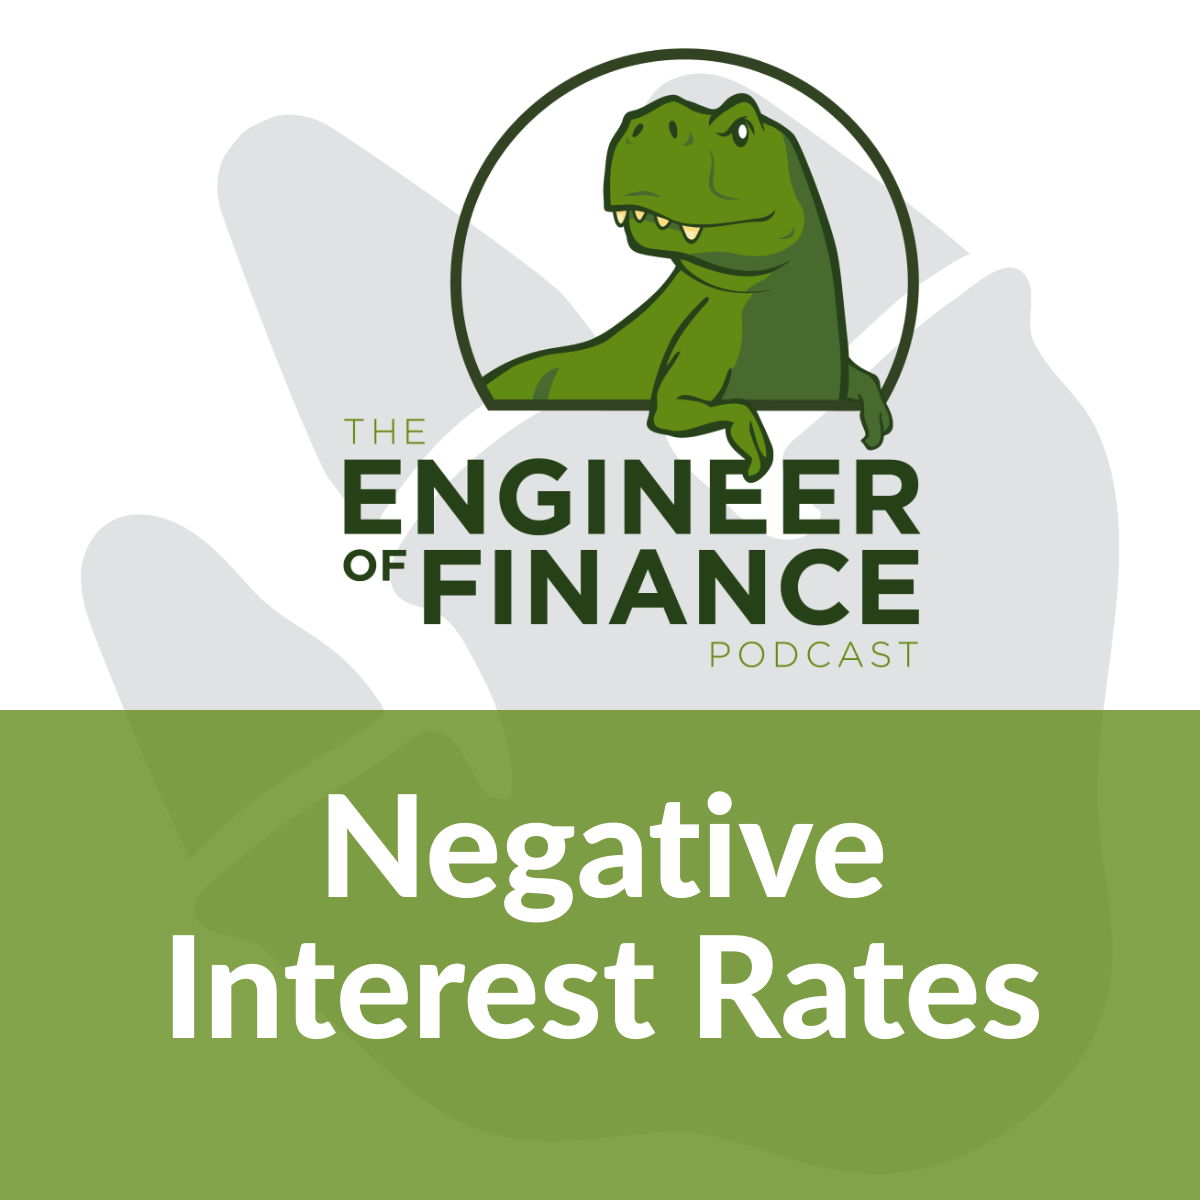 Negative Interest Rates – Episode 133